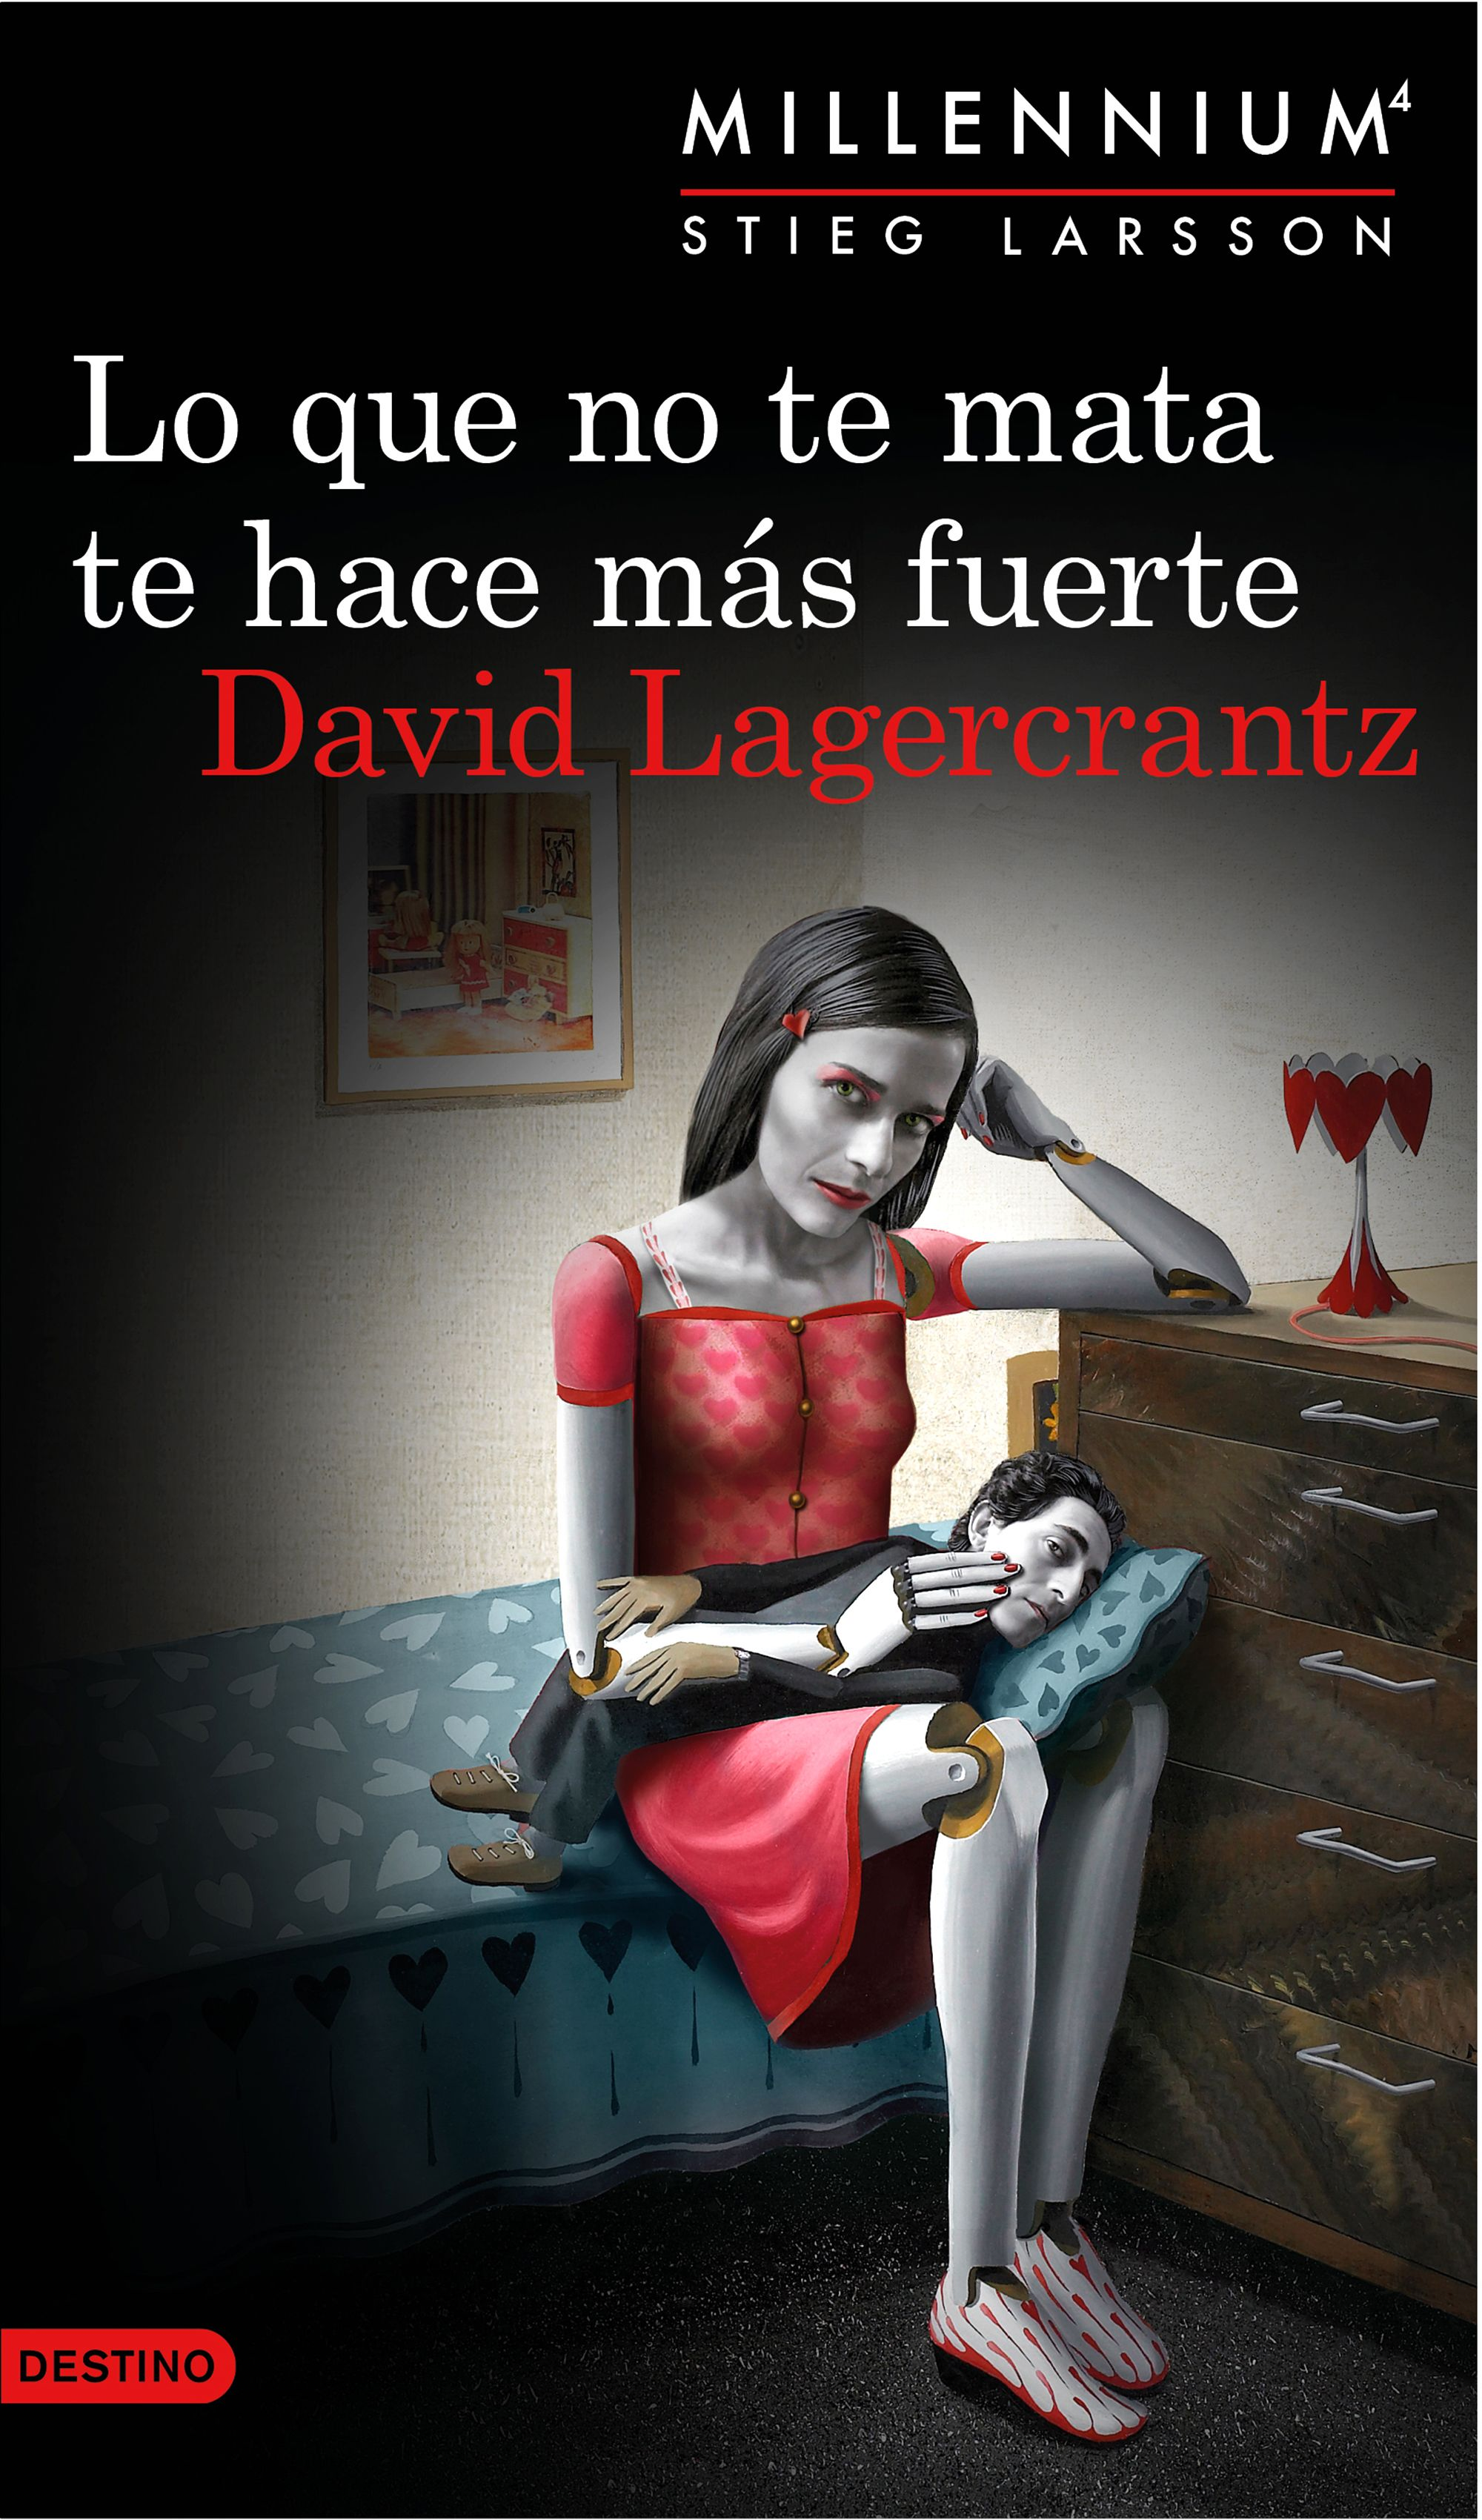 Lo que no te mata te hace más fuerte - David Lagercrantz Millennium 4 - Portada